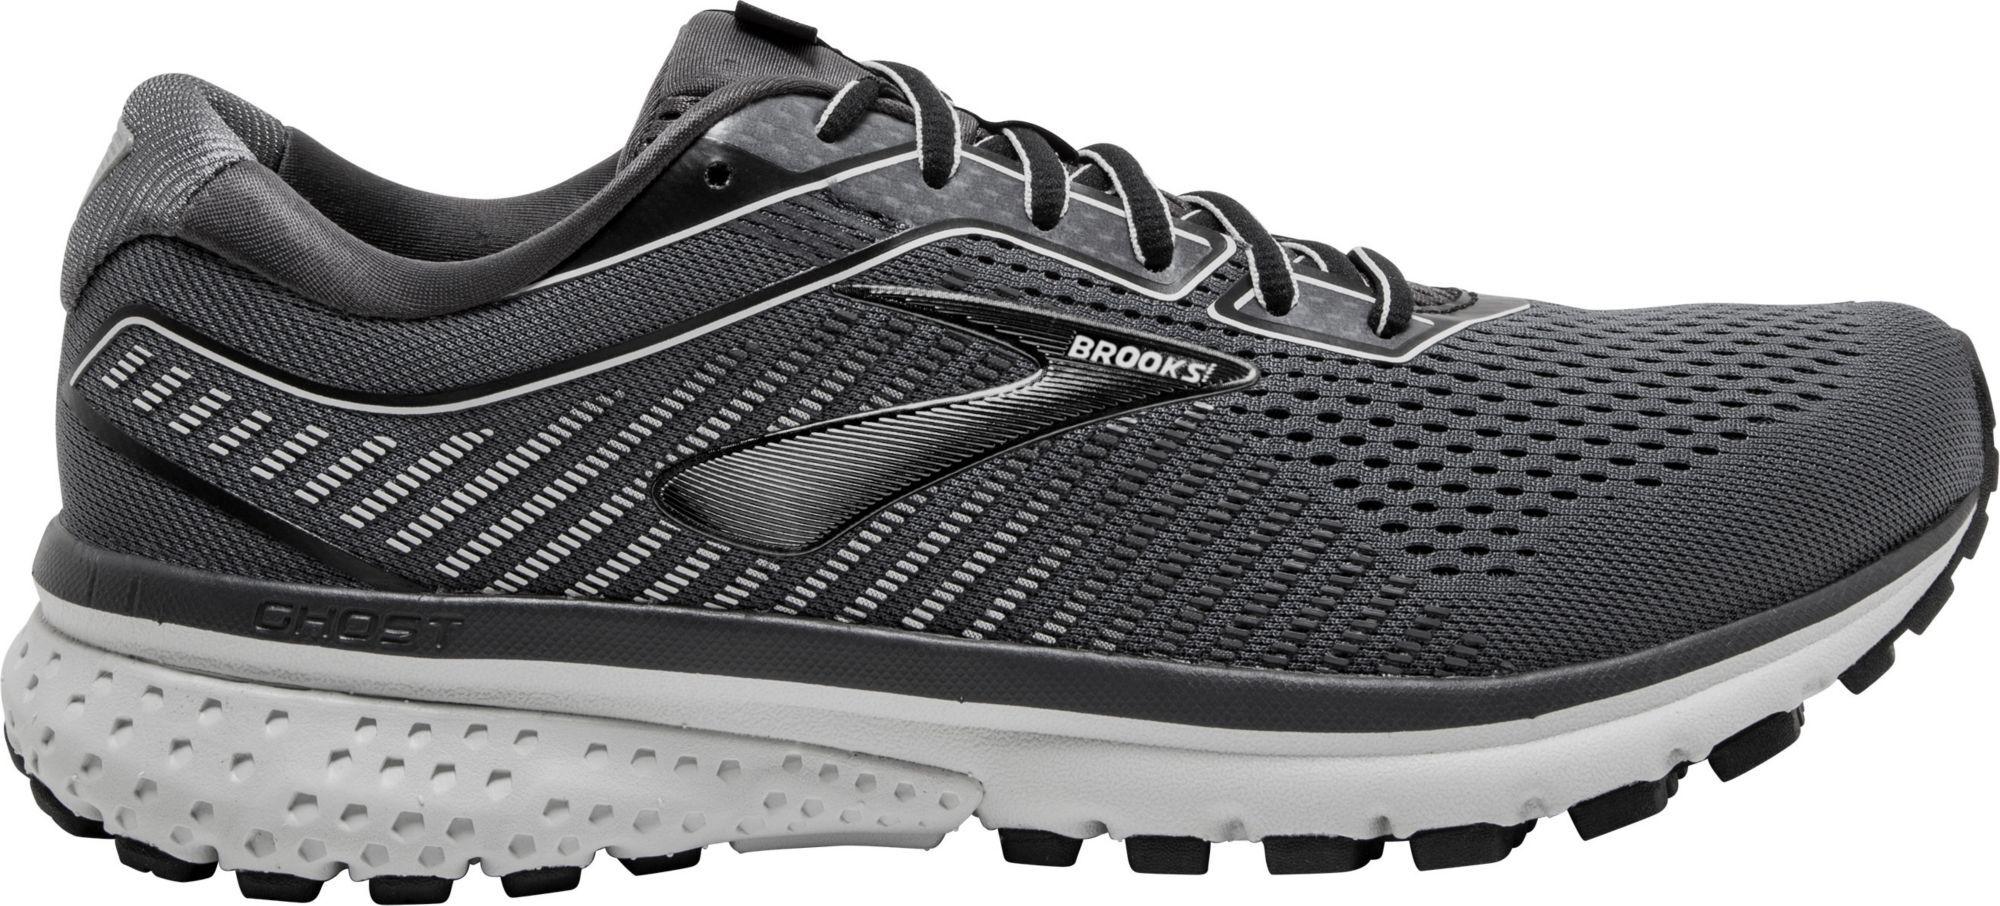 Brooks Men's Ghost 12 Running Shoes, Black